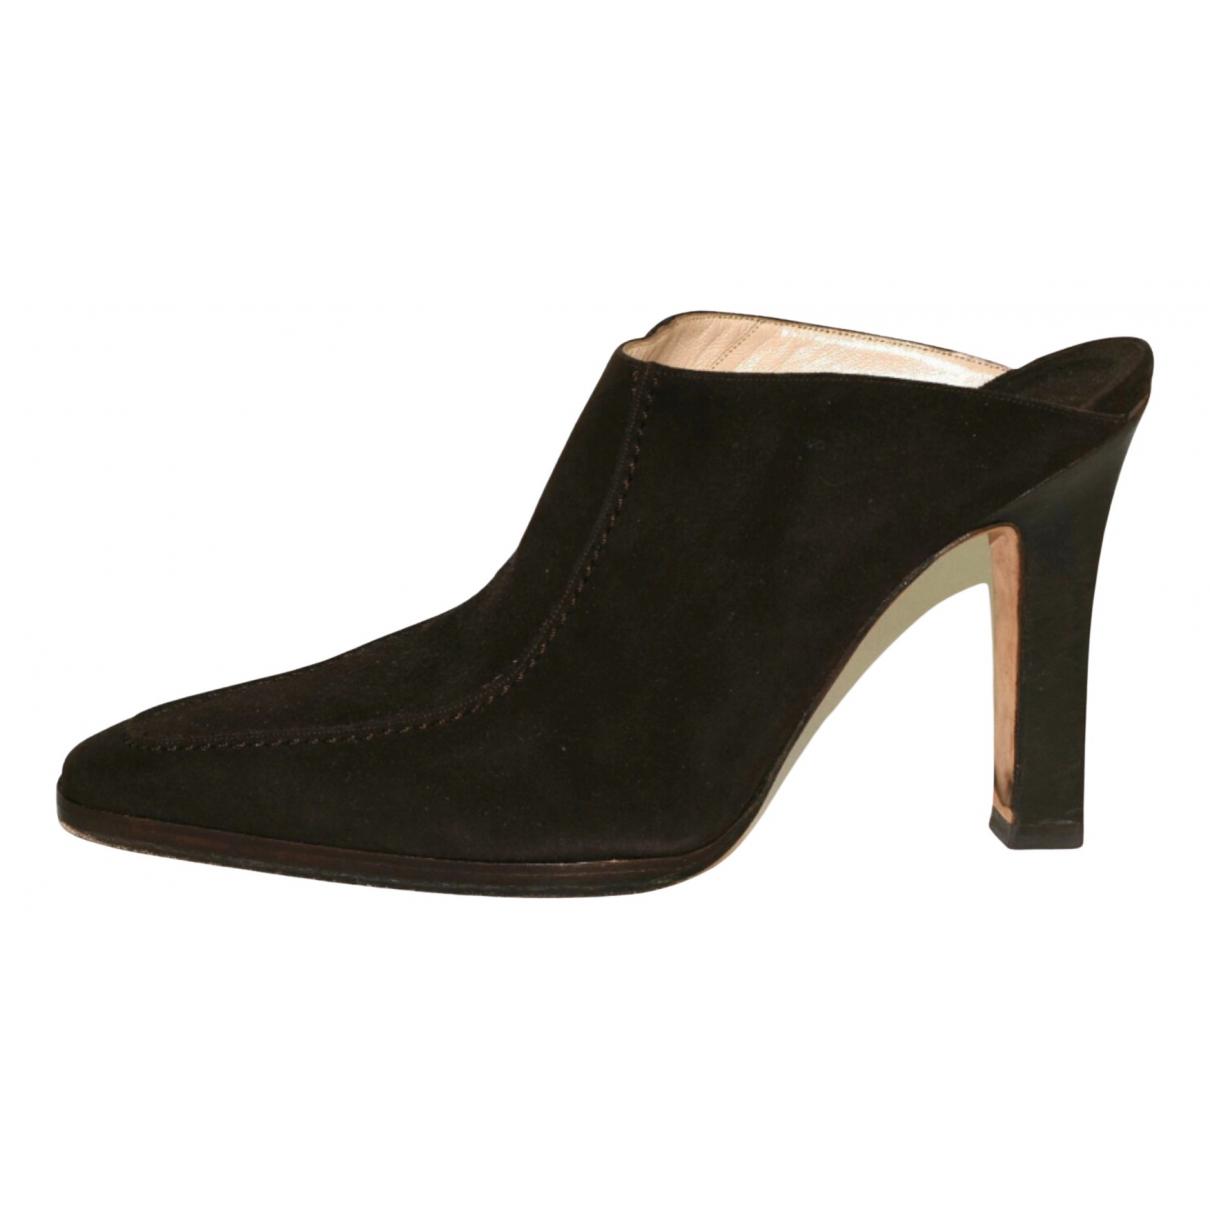 Manolo Blahnik N Brown Suede Sandals for Women 38.5 EU